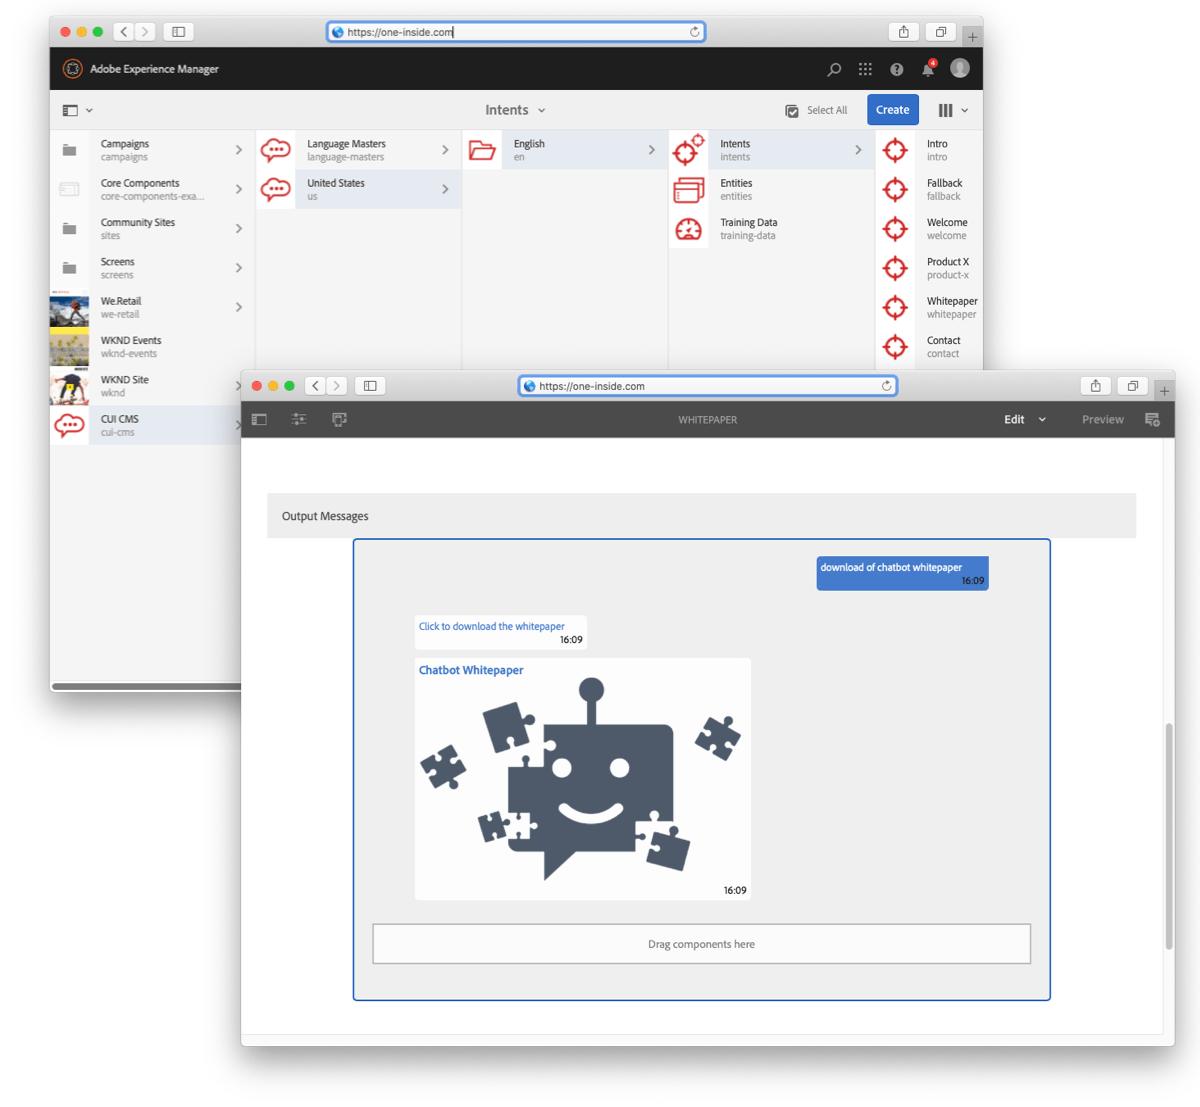 AEM Chatbot module -create content